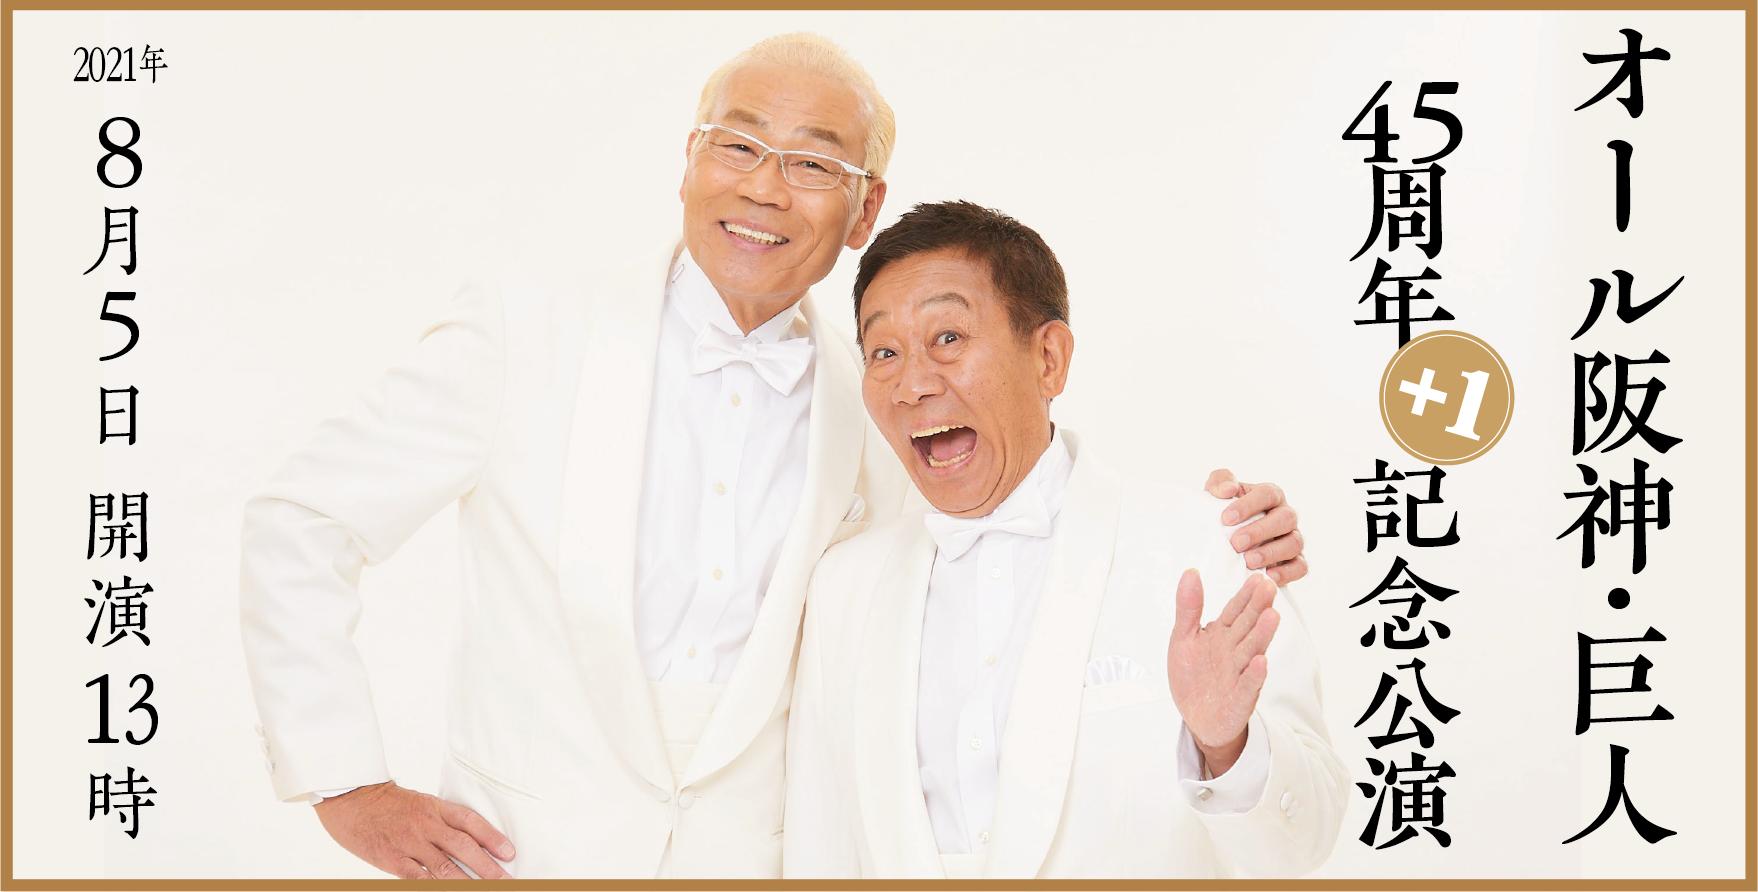 オール阪神・巨人 45周年+1記念公演